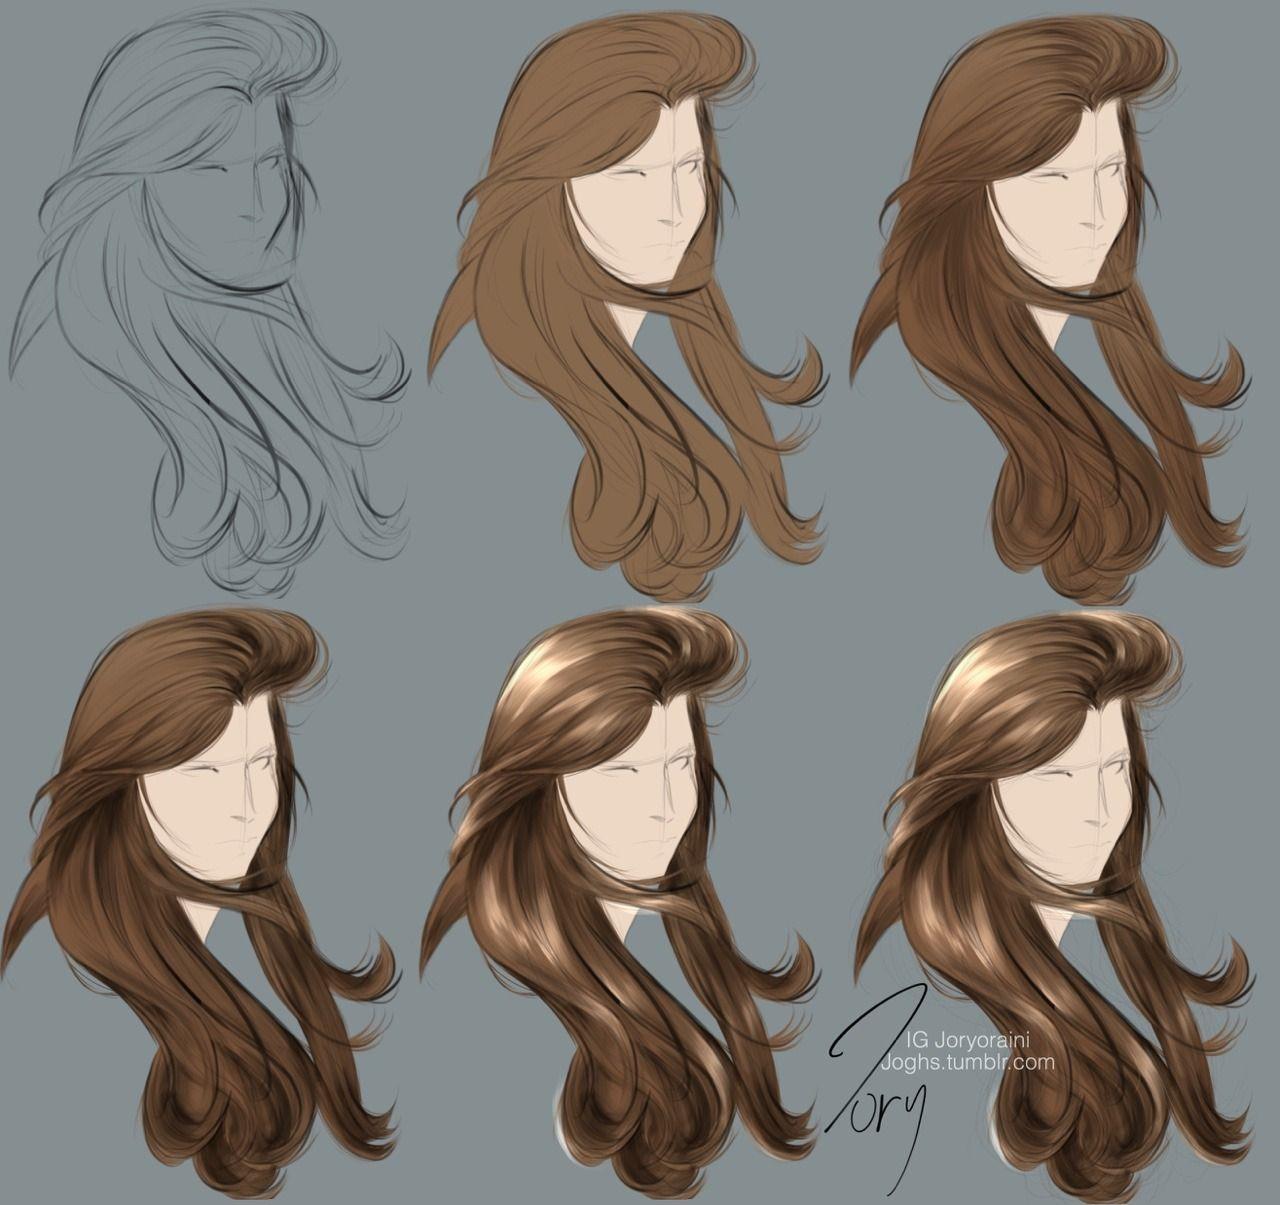 Jory S Trash Digital Art Tutorial Digital Painting Tutorials Hair Painting